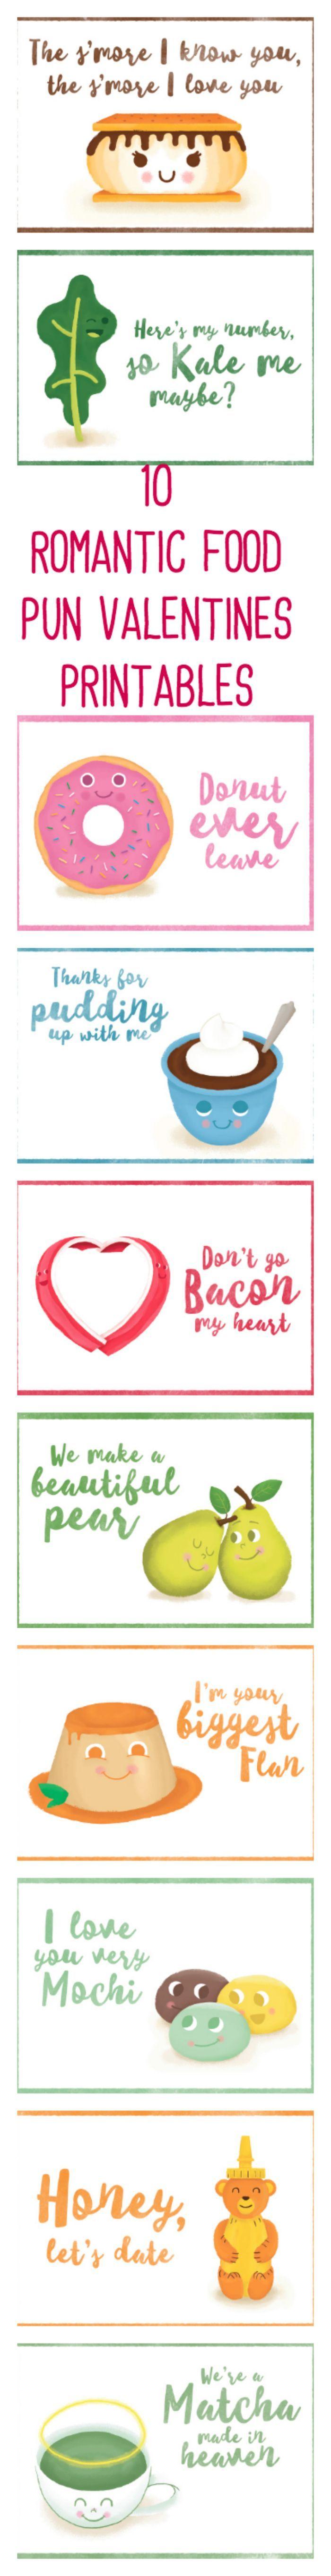 Romantic Food Pun Valentines Printables